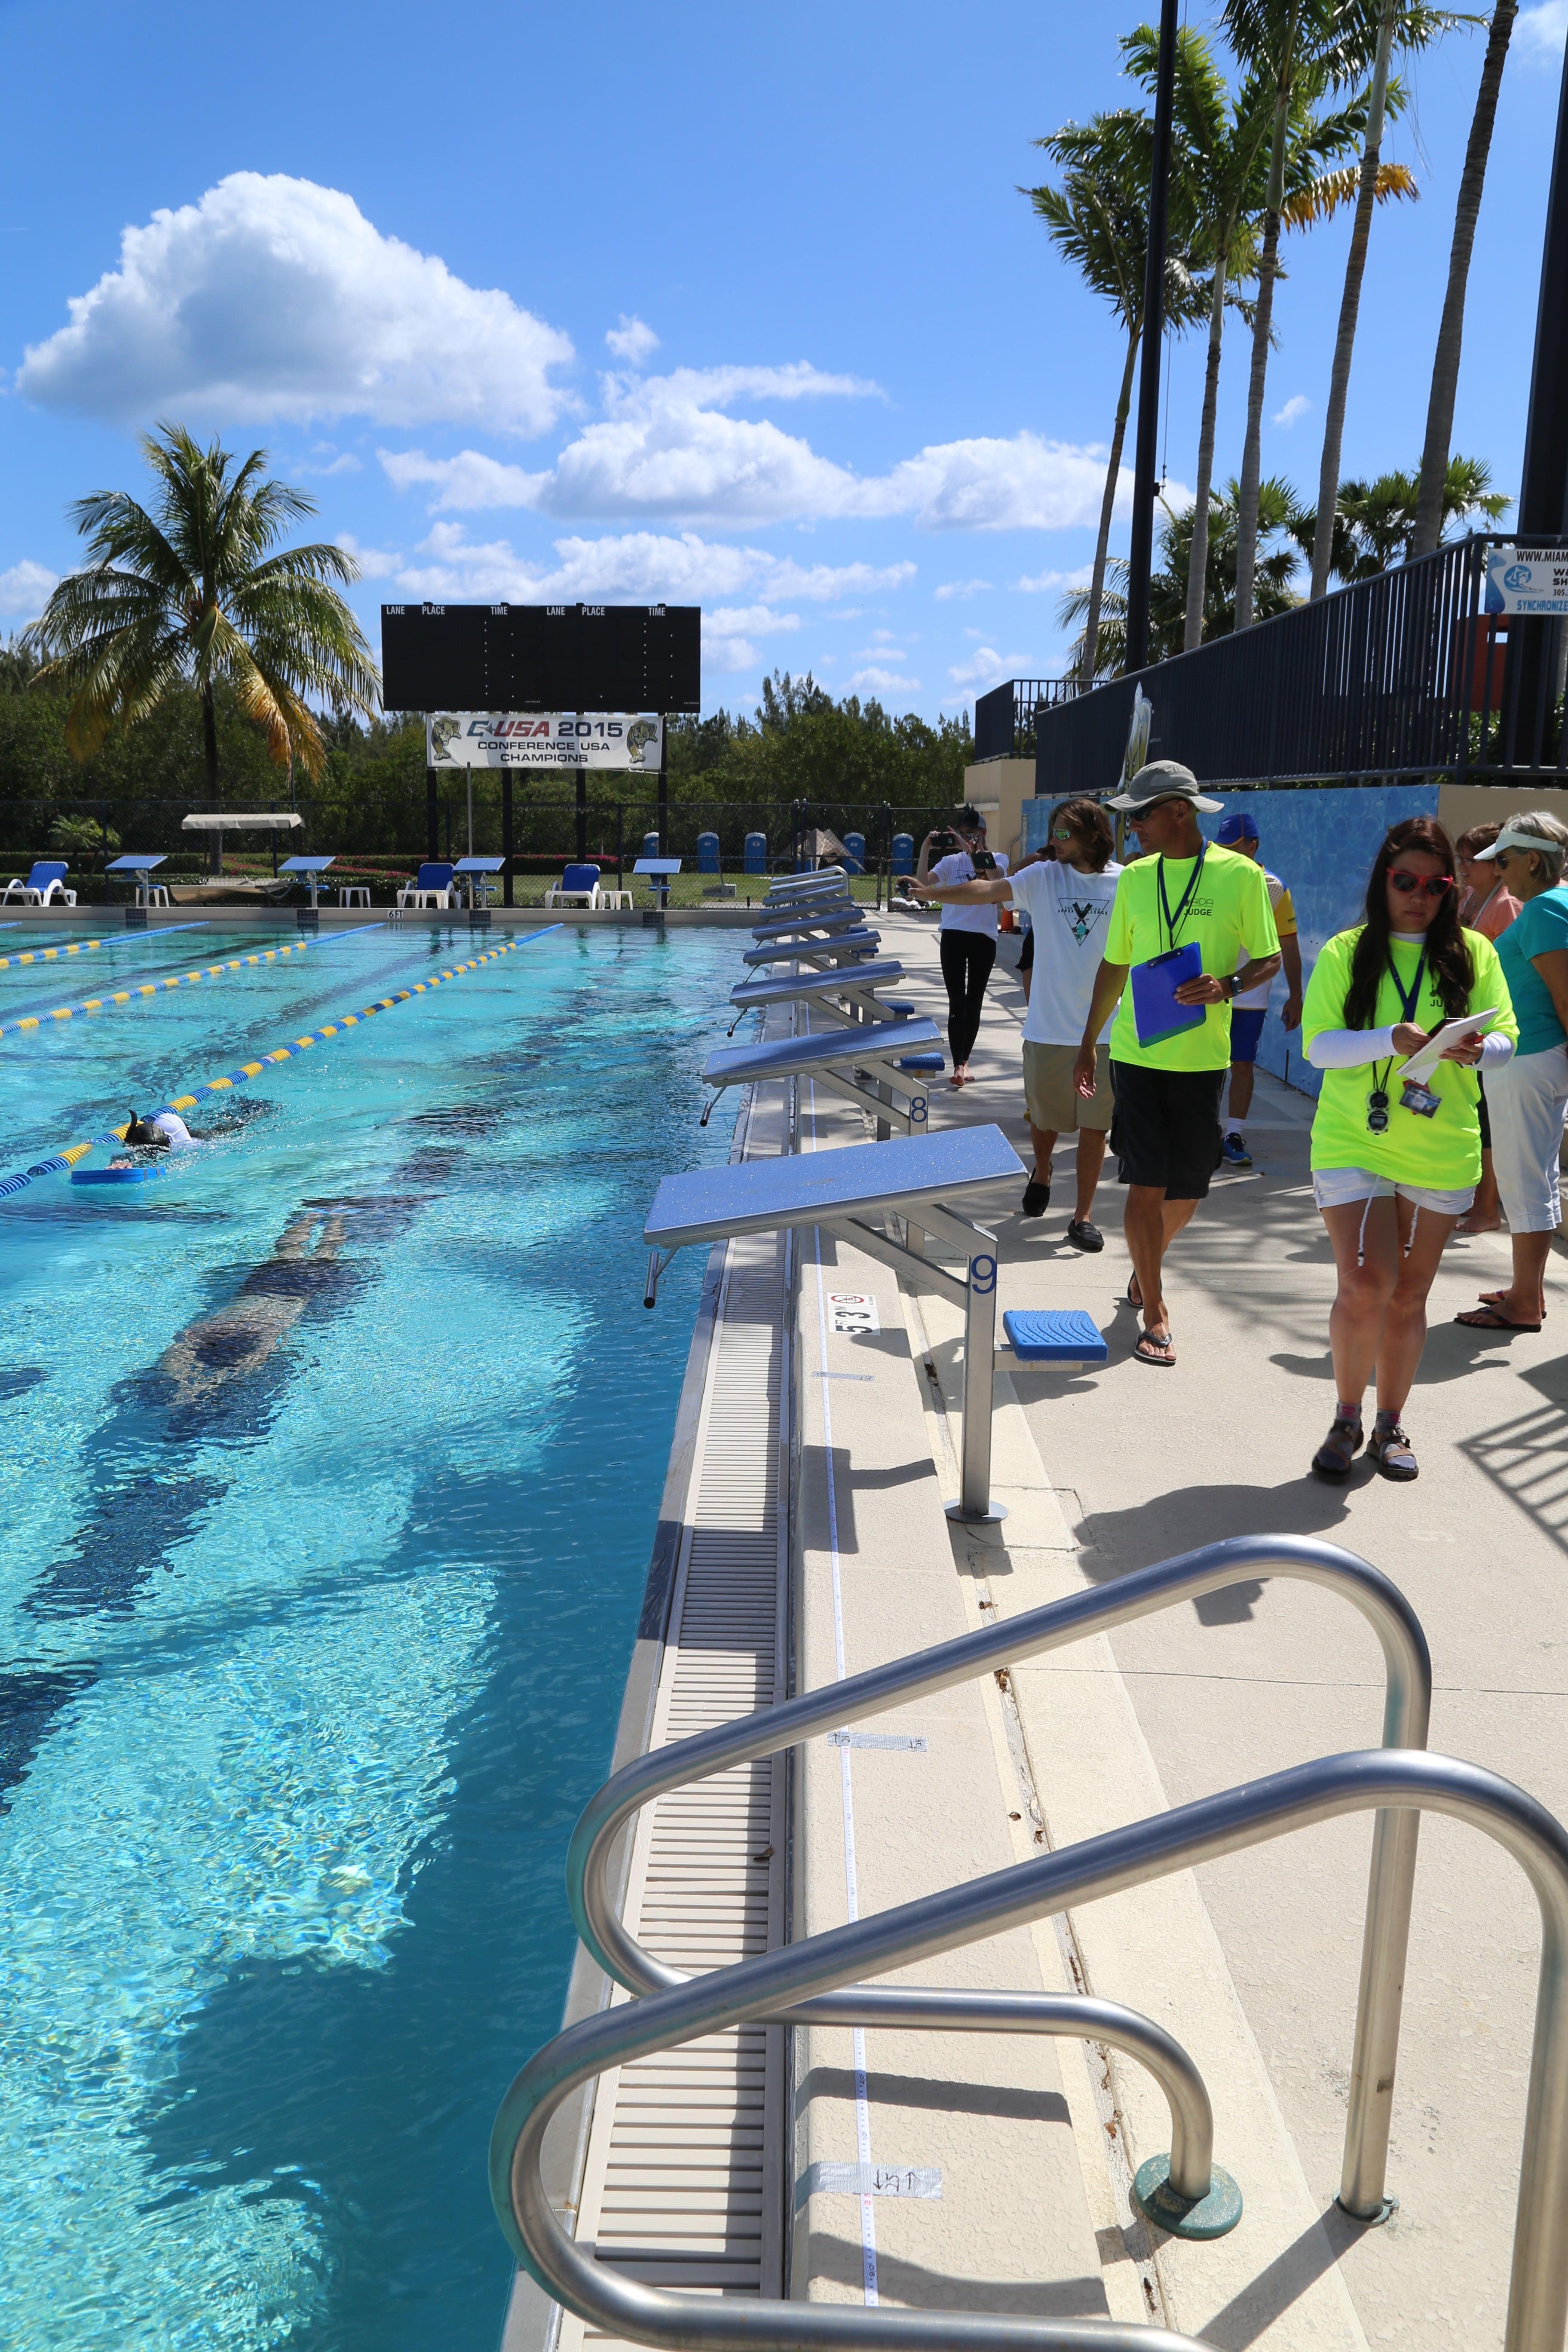 Eddy Gonzalez in the SFAC Dynamic heat at the FIU pool